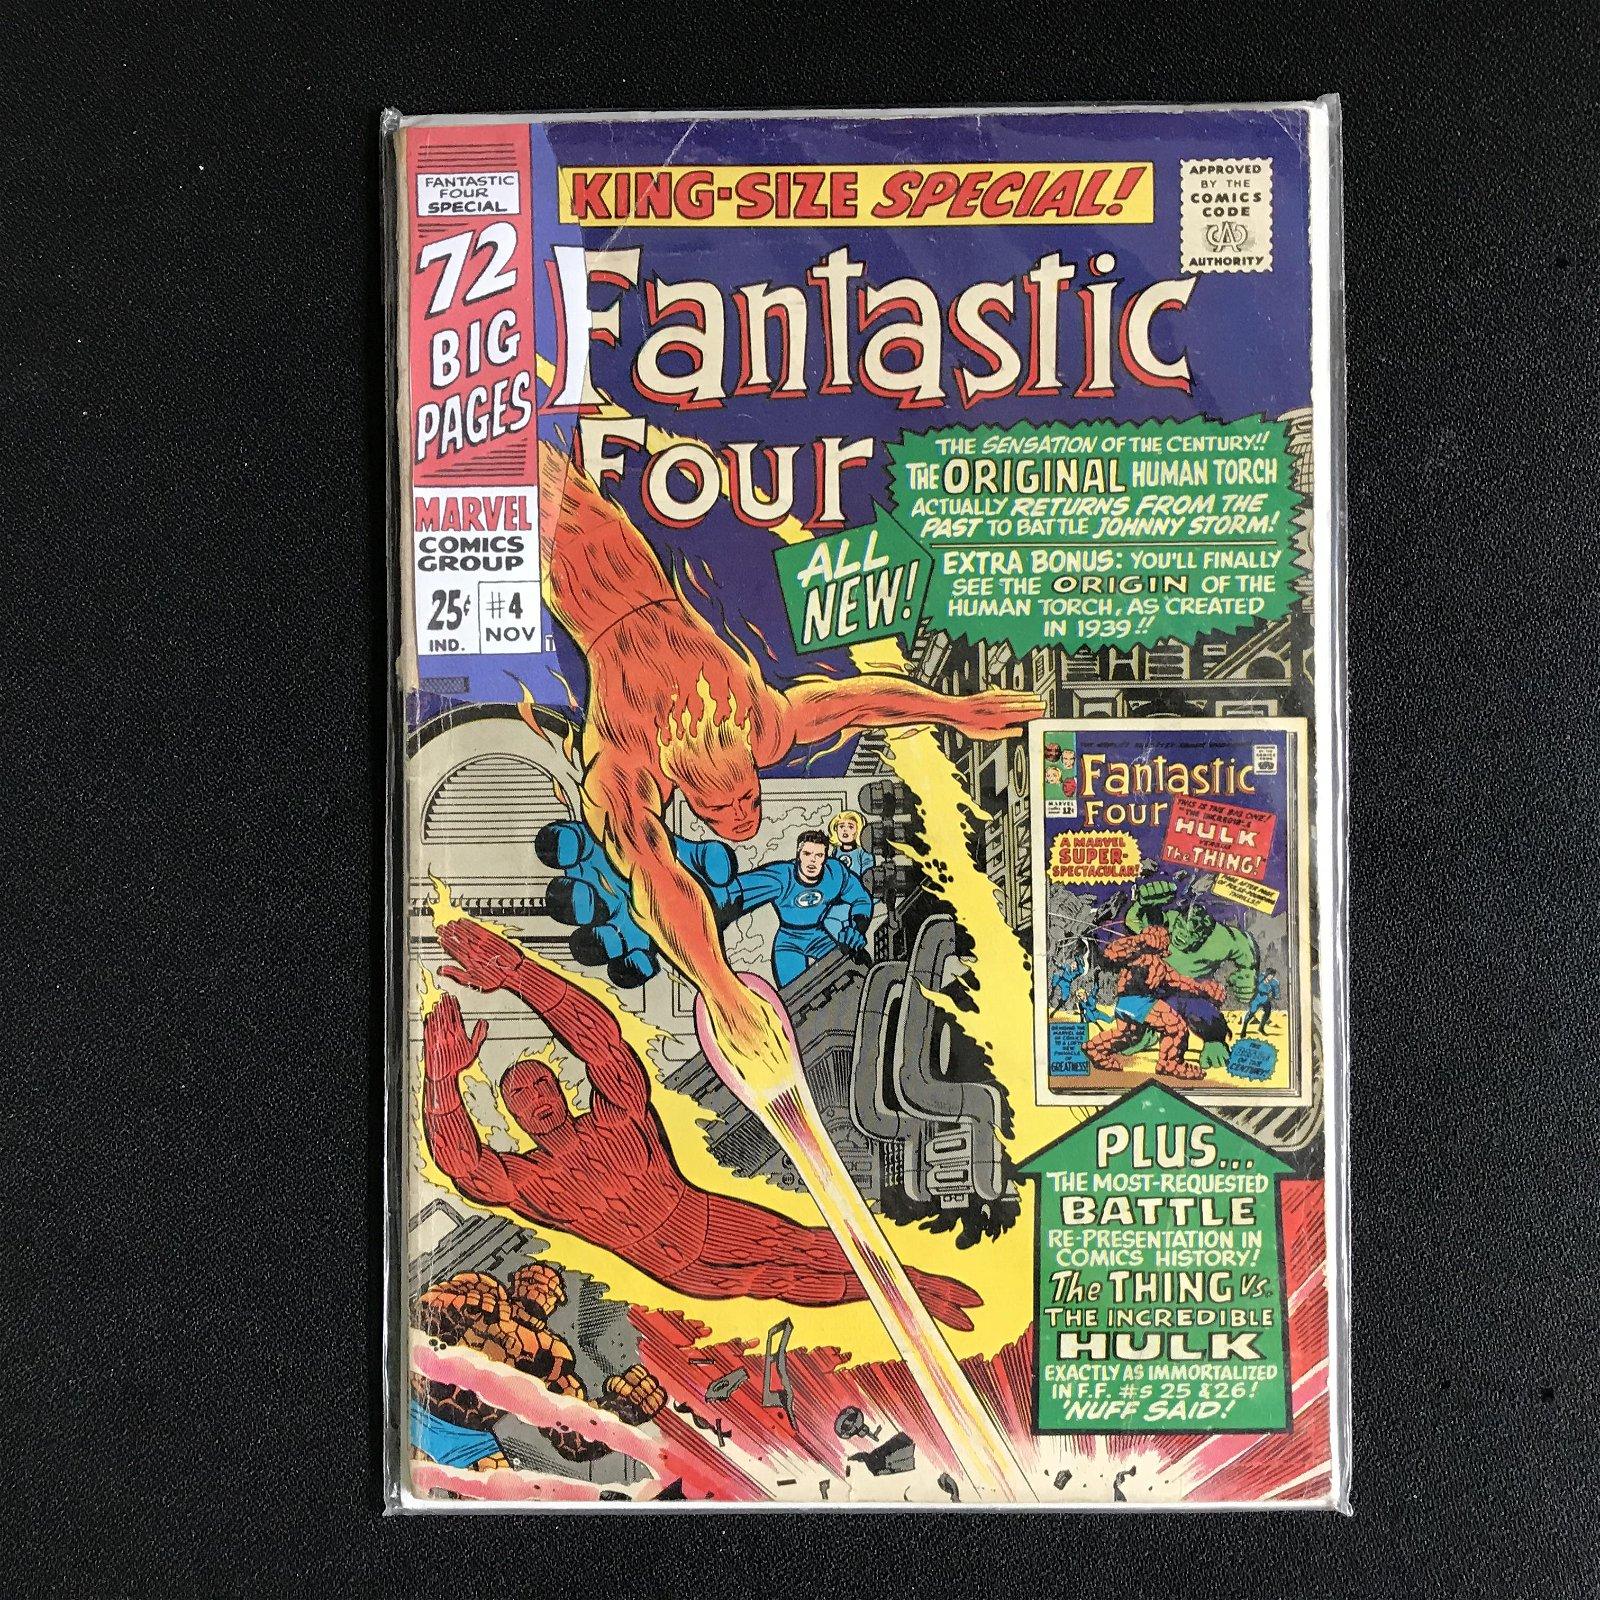 FANTASTIC FOUR #4 (MARVEL COMICS) KING-SIZE SPECIAL!